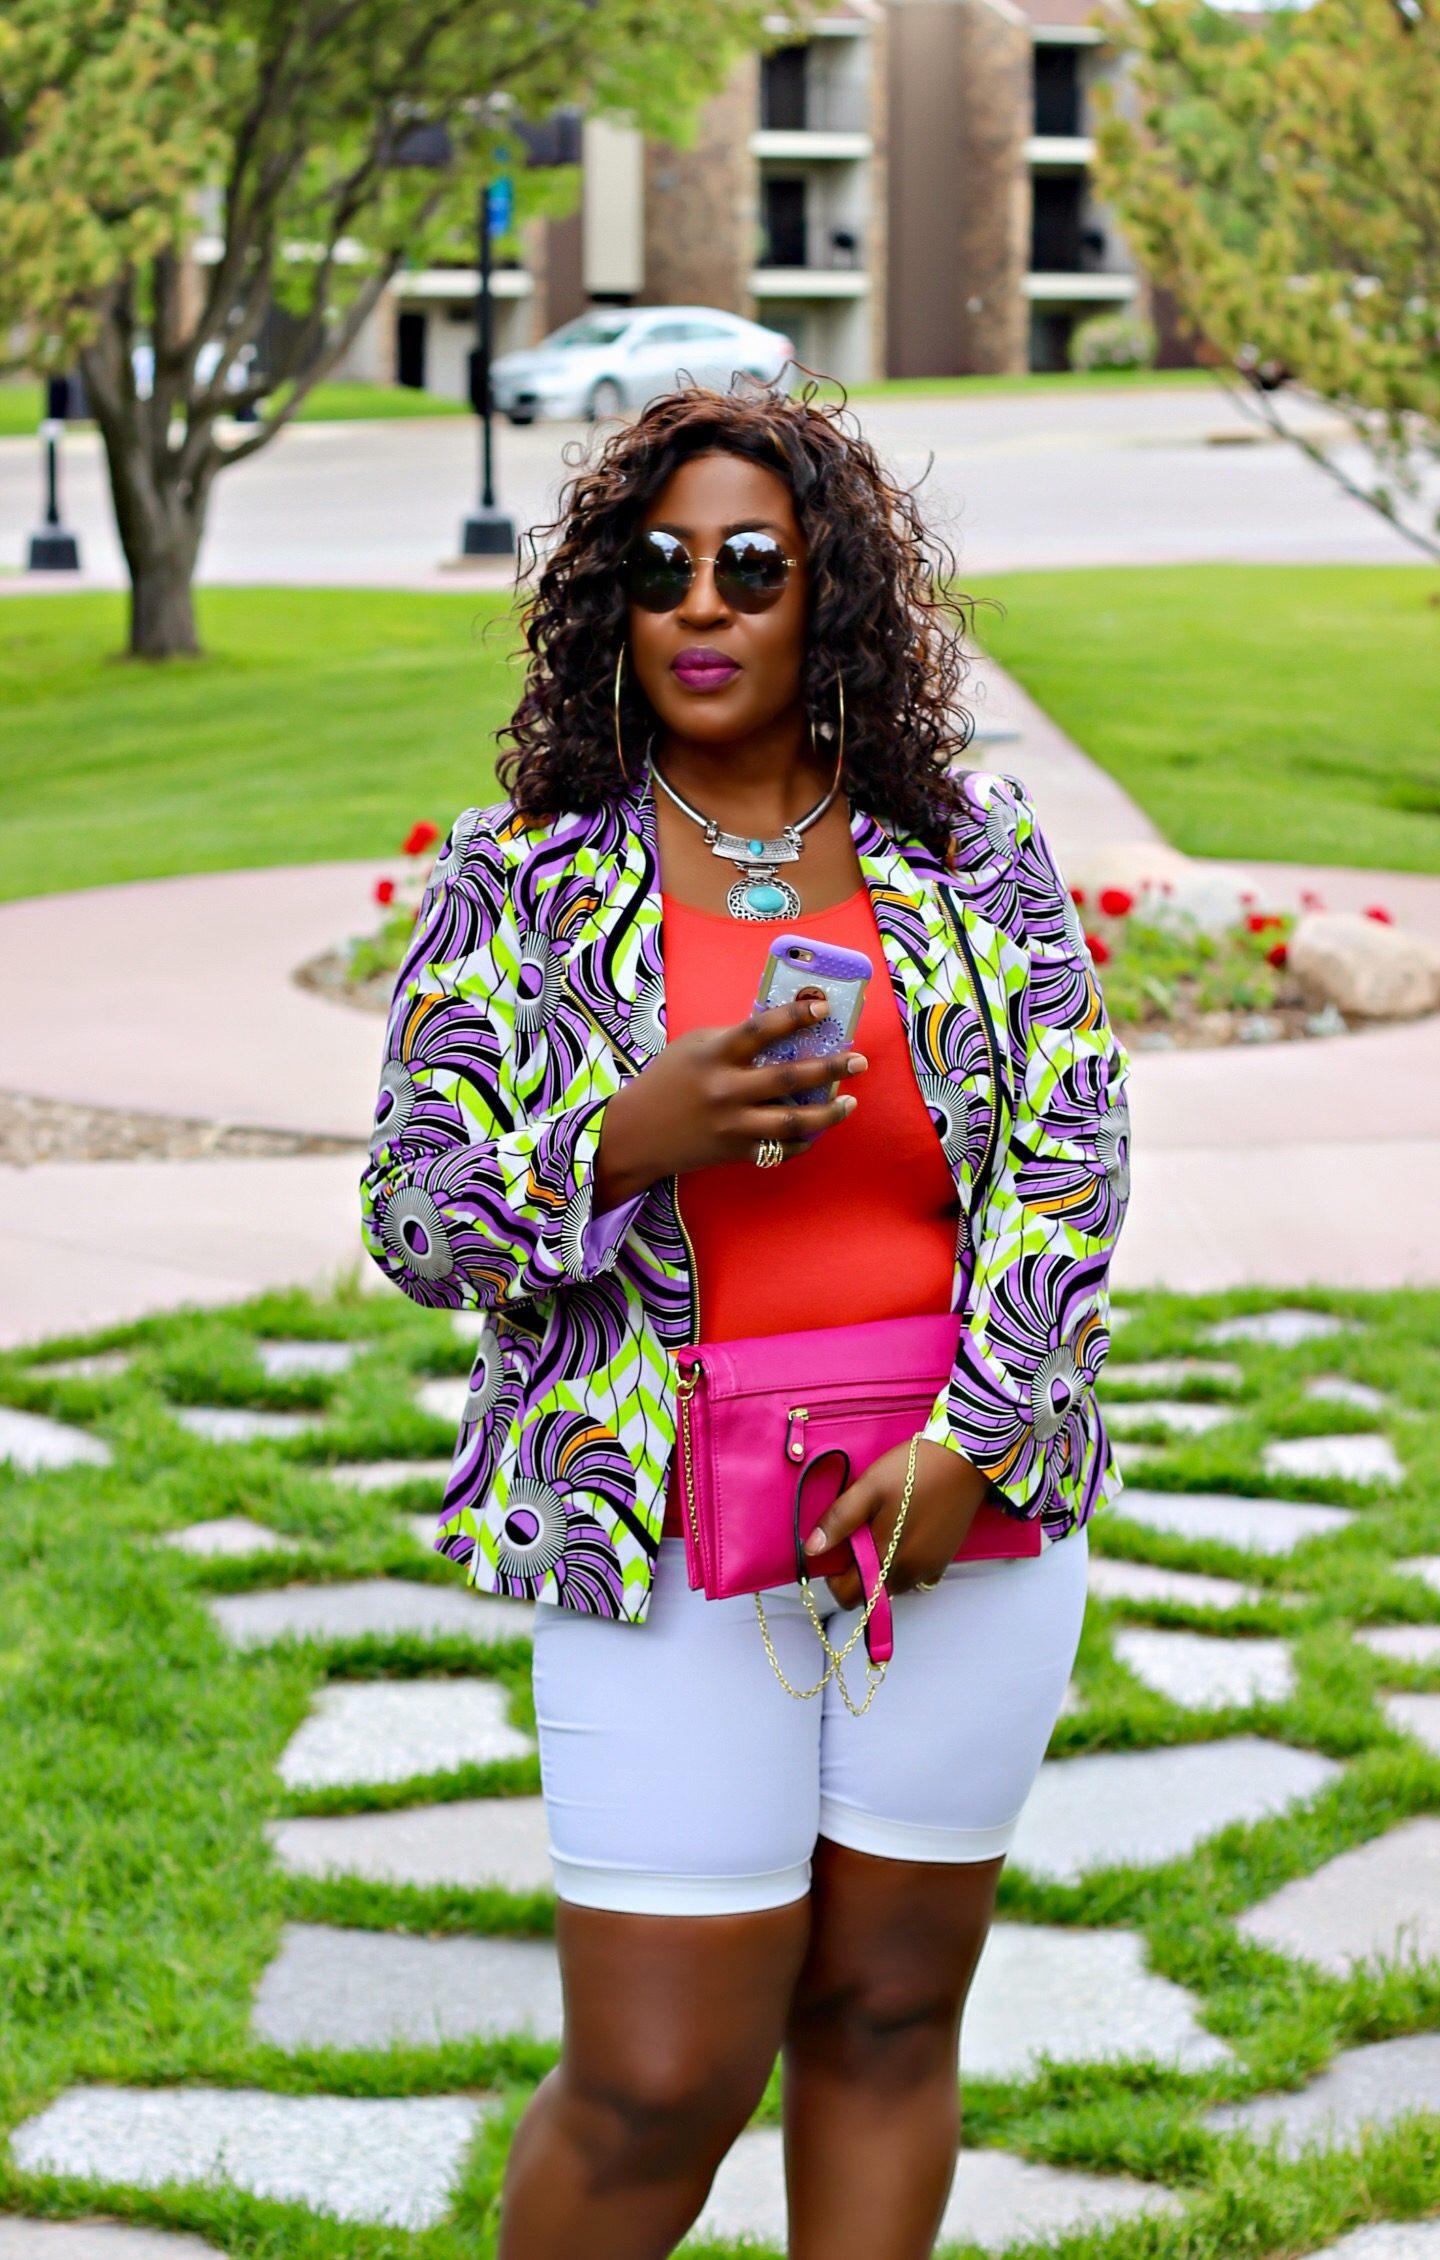 Believe-fashion-white-shortBeautiful-black-woman-ankara-summer-fashion